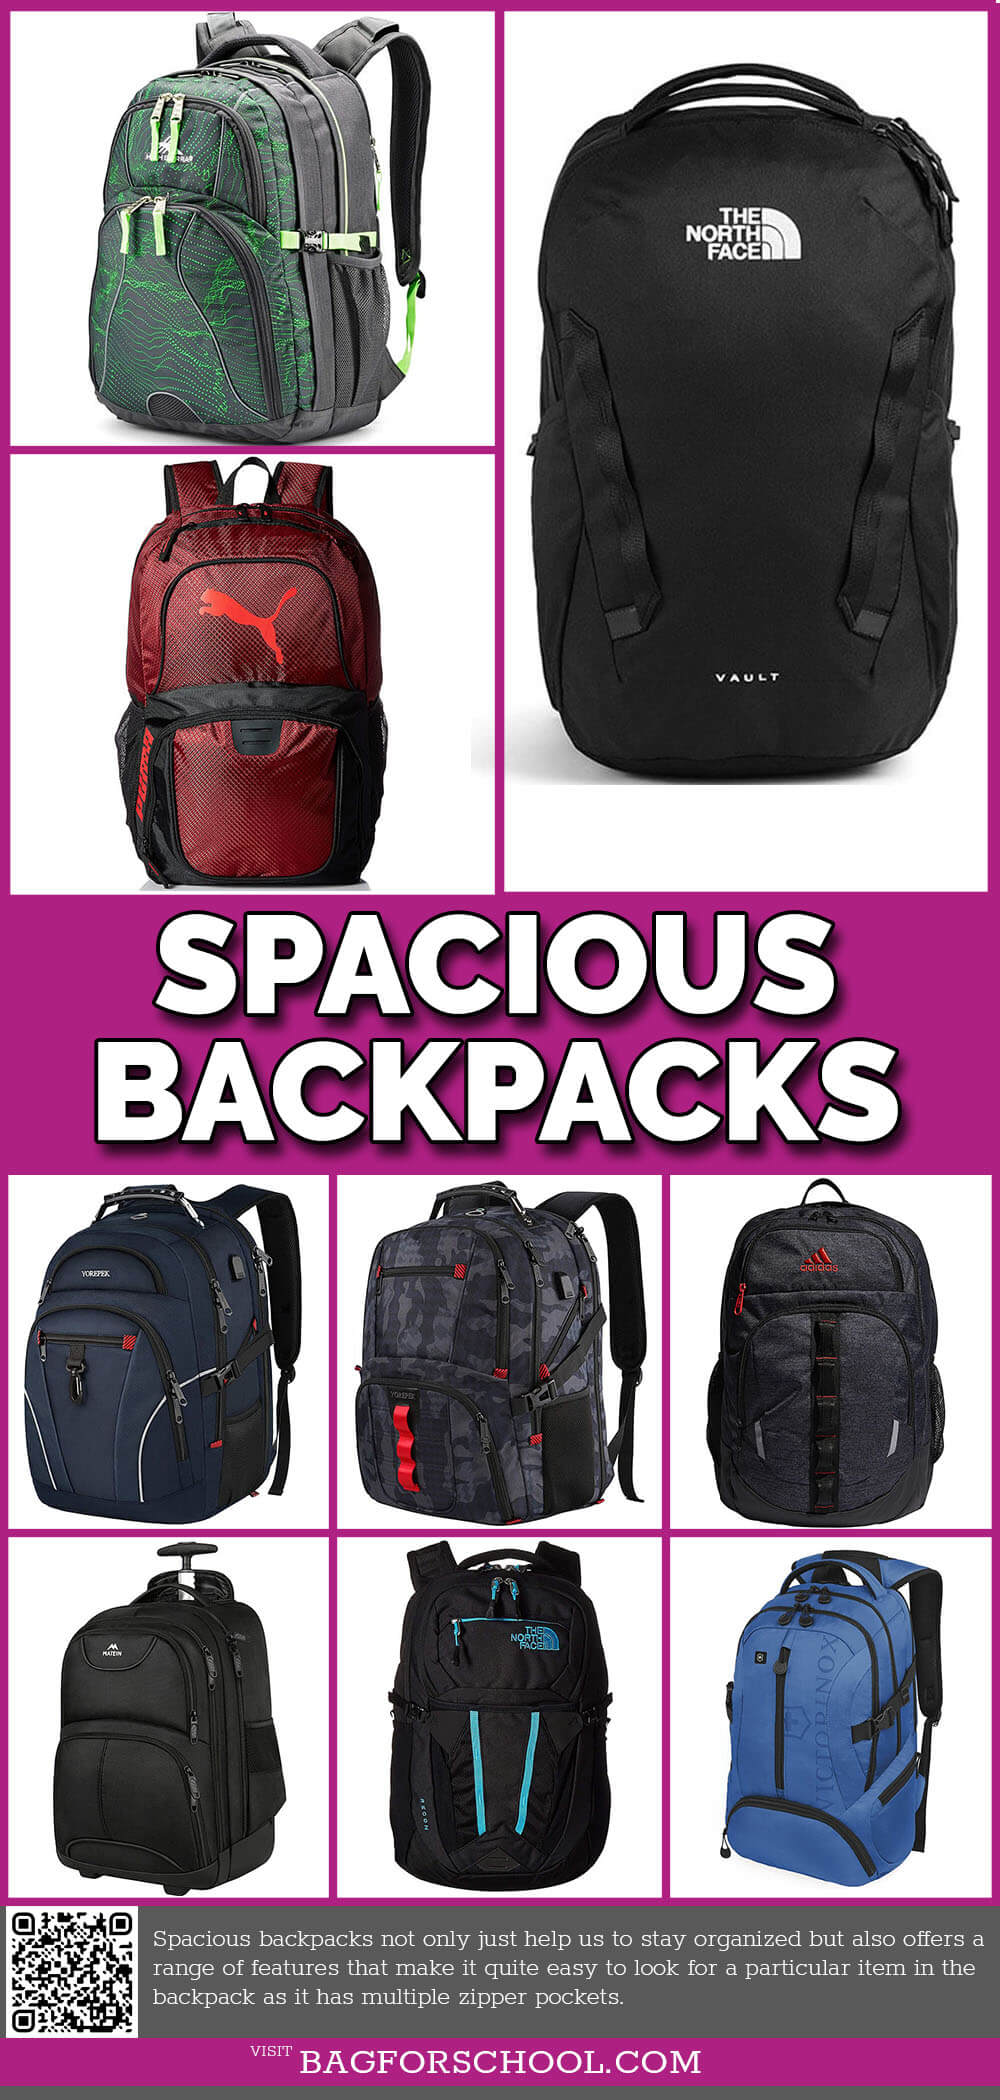 Spacious Backpacks